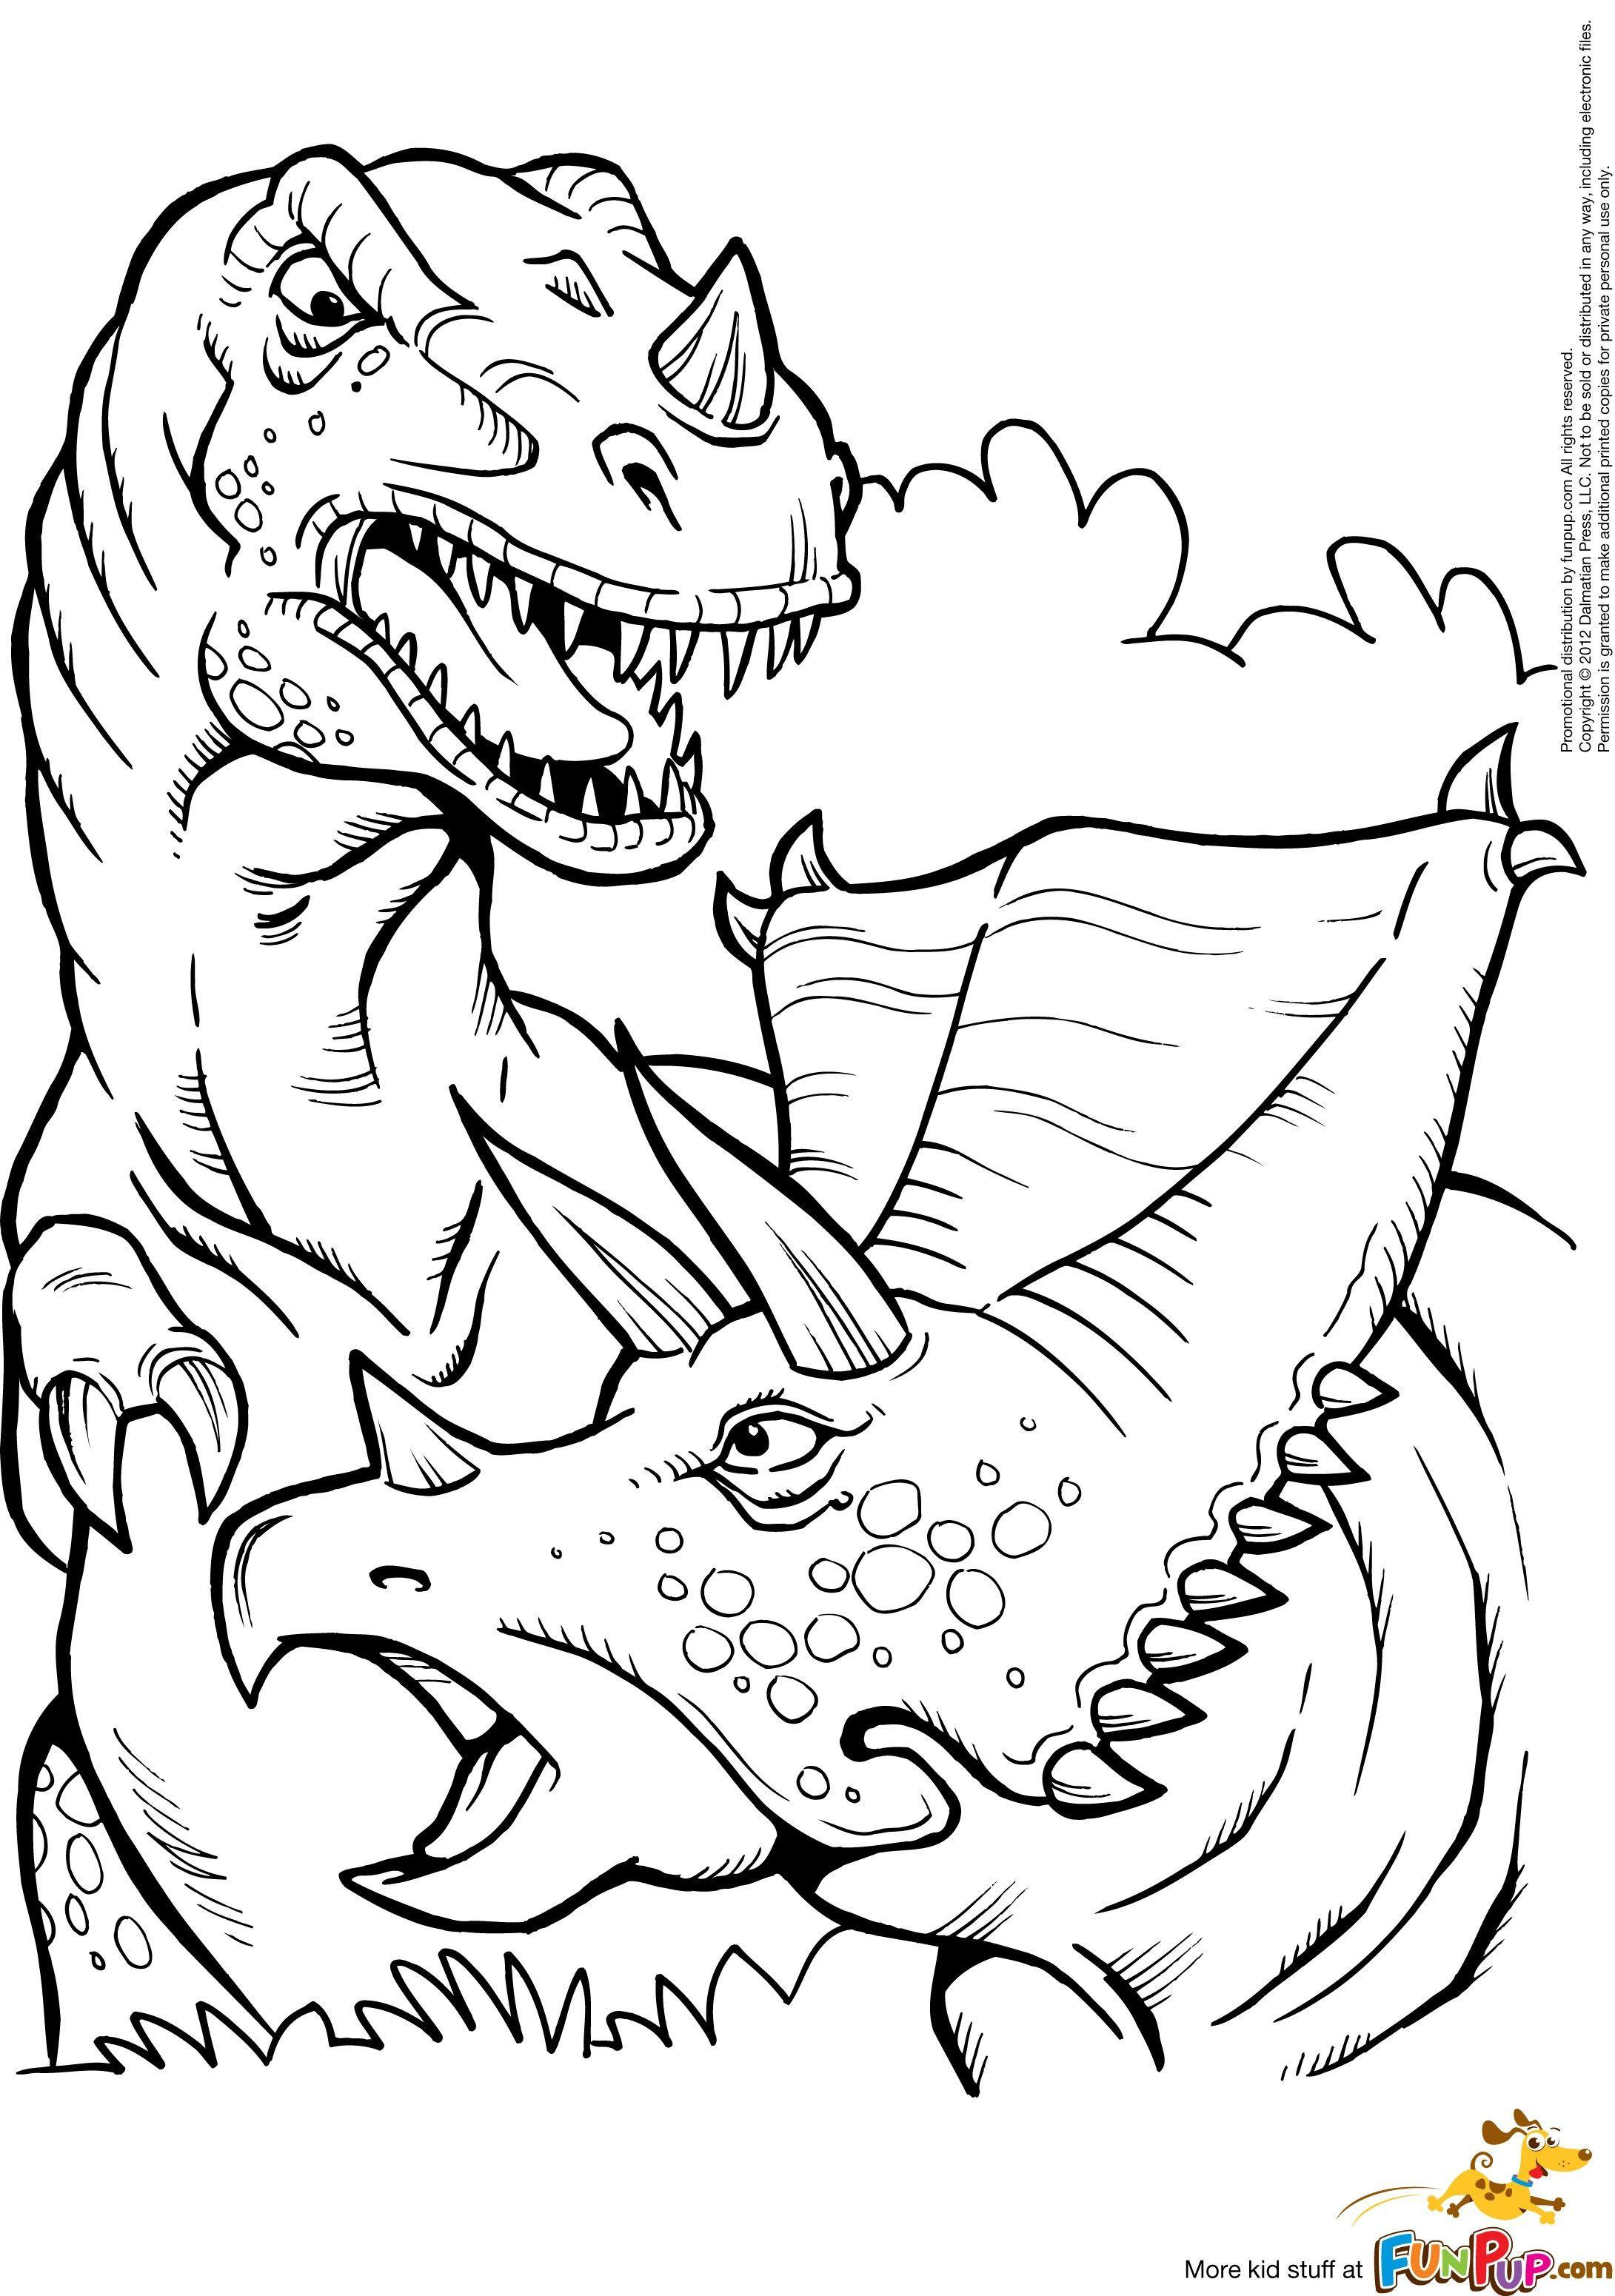 Tyrannosaurus Rex Ausmalbild Neu Castle Color Page Coloring Pages Coloring Pages Neu Tyrannosaurus Sammlung